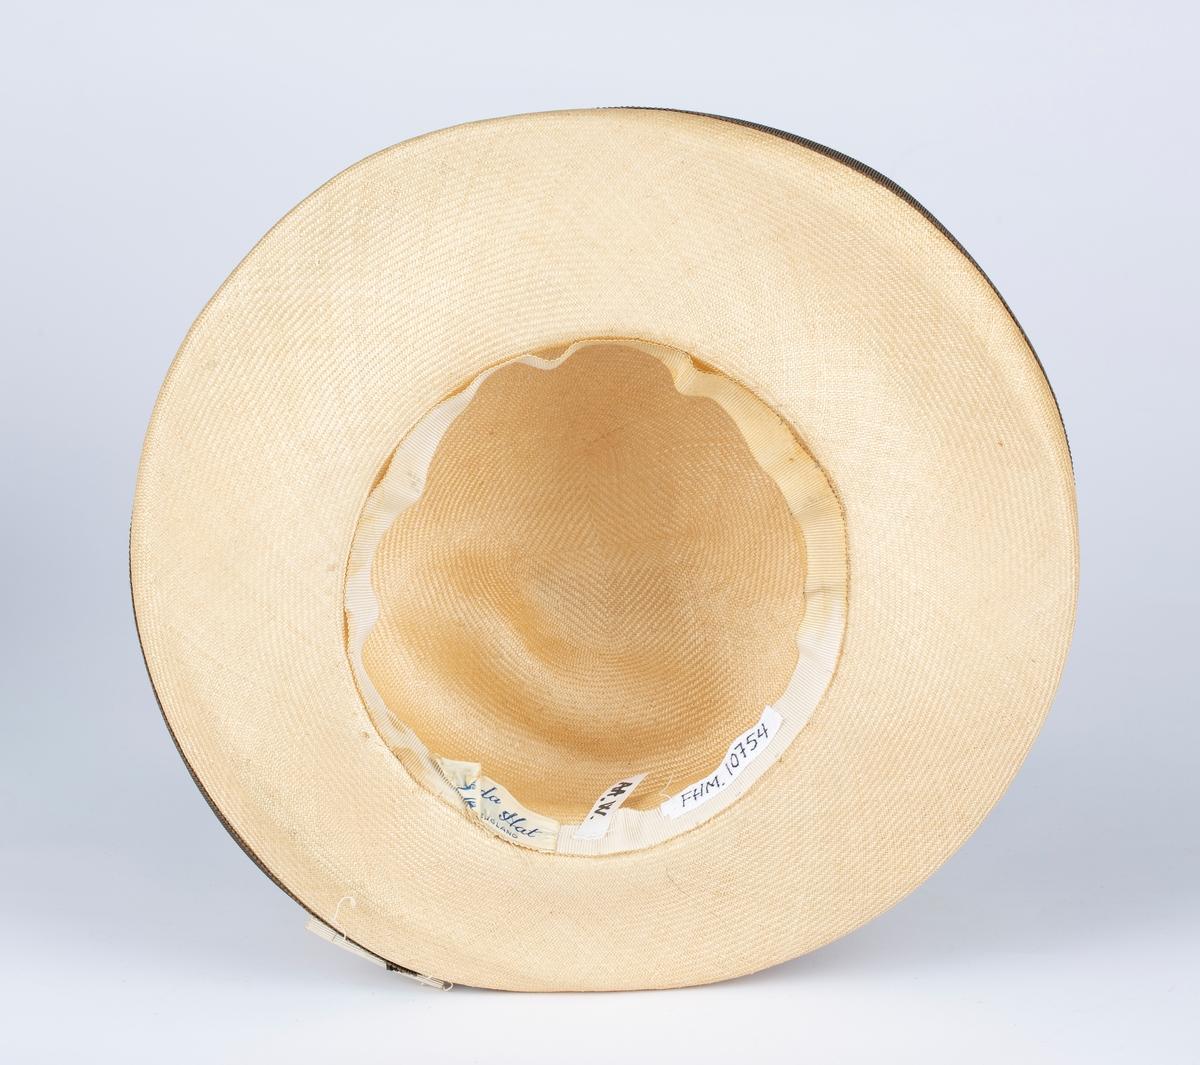 Rund hattepull, vid brem kantet med brunt ripsbåndhattebånd. Rundt hodepullen bredt ripsvevet , lyst hattebånd med sløyfe bak.